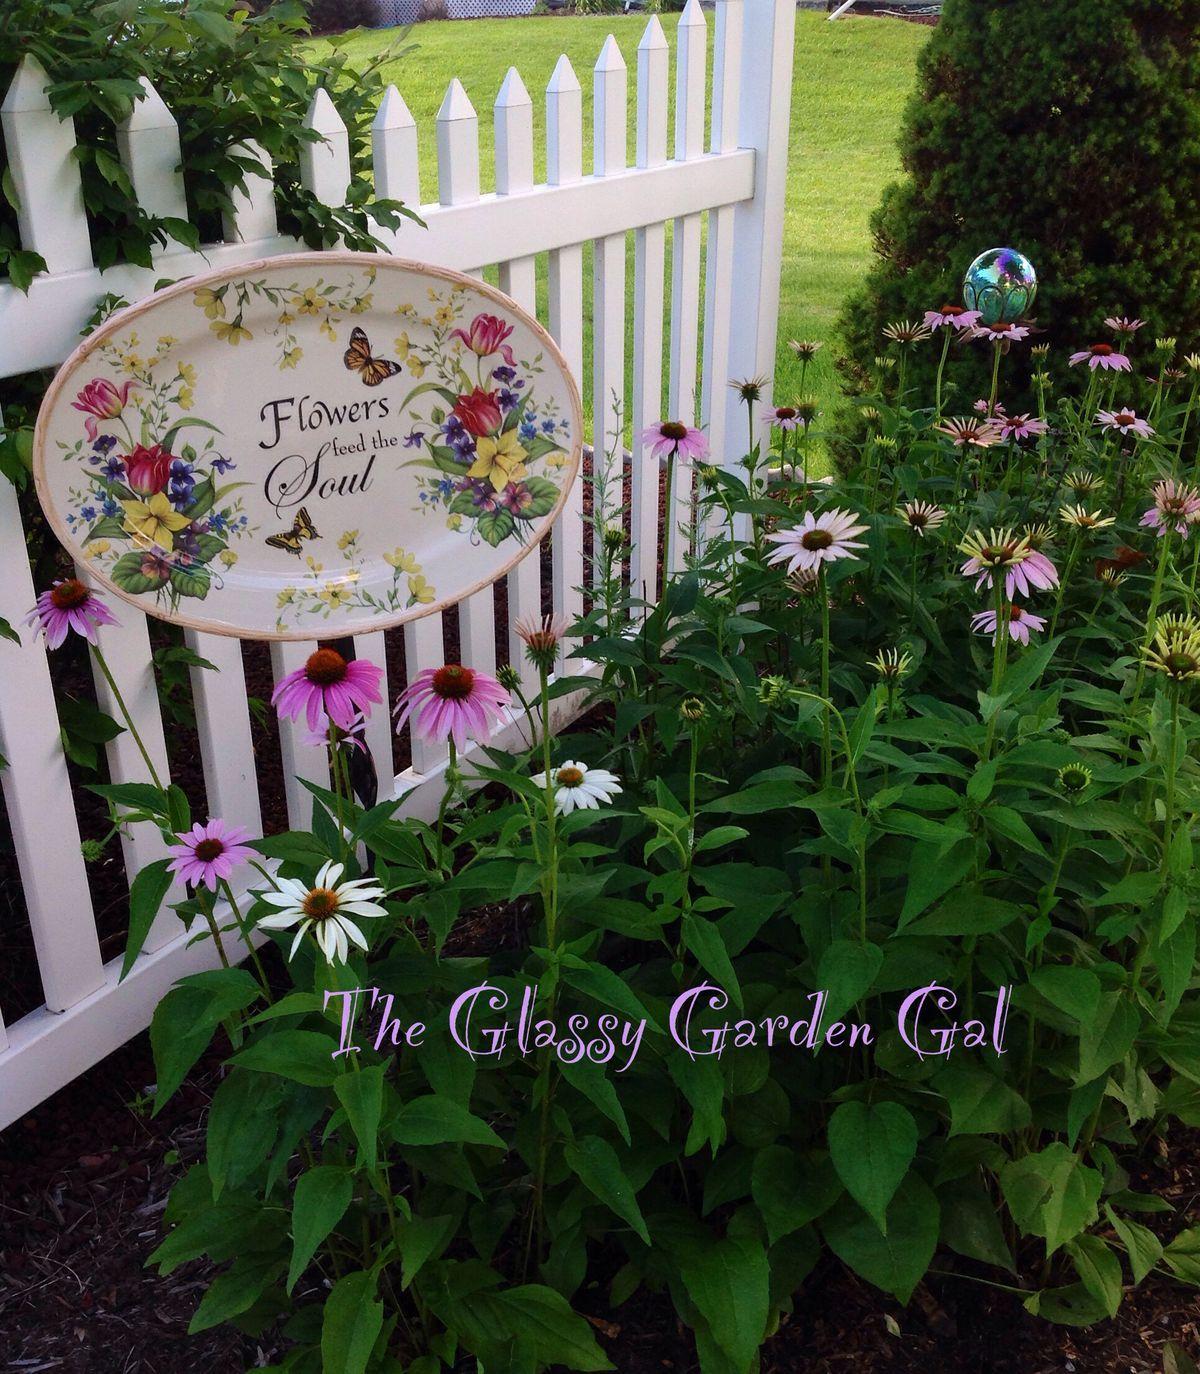 cdc8a9e6bd64c3a3ebb19ffb2f1ef6f3.jpg 1,200×1,374 pixels | Garden ...